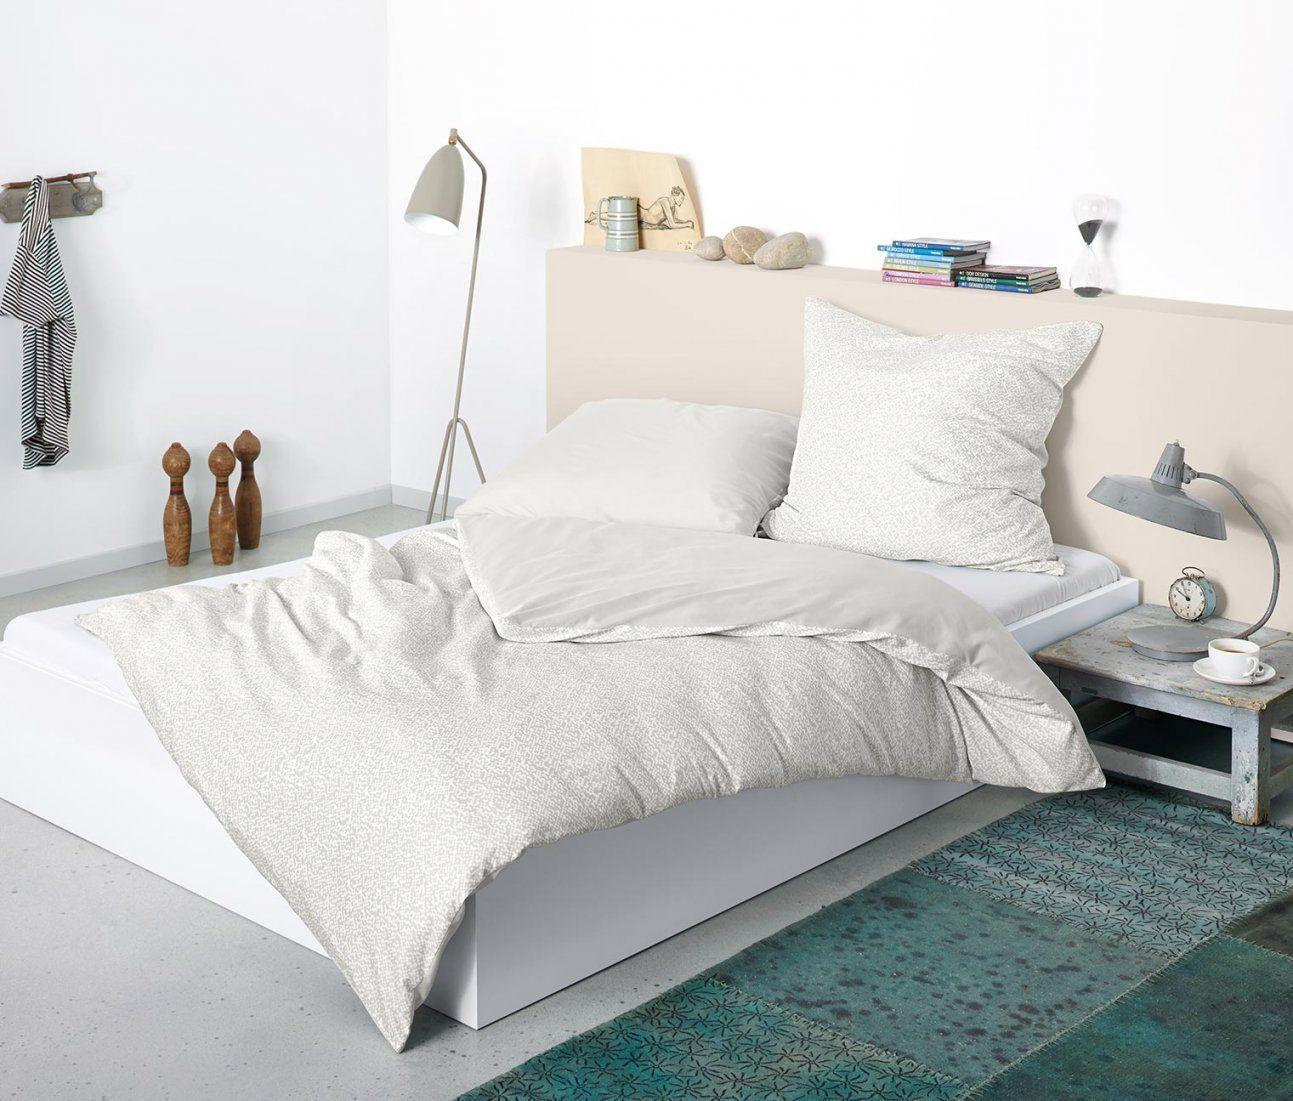 bettw sche 155x220 tchibo haus design ideen. Black Bedroom Furniture Sets. Home Design Ideas